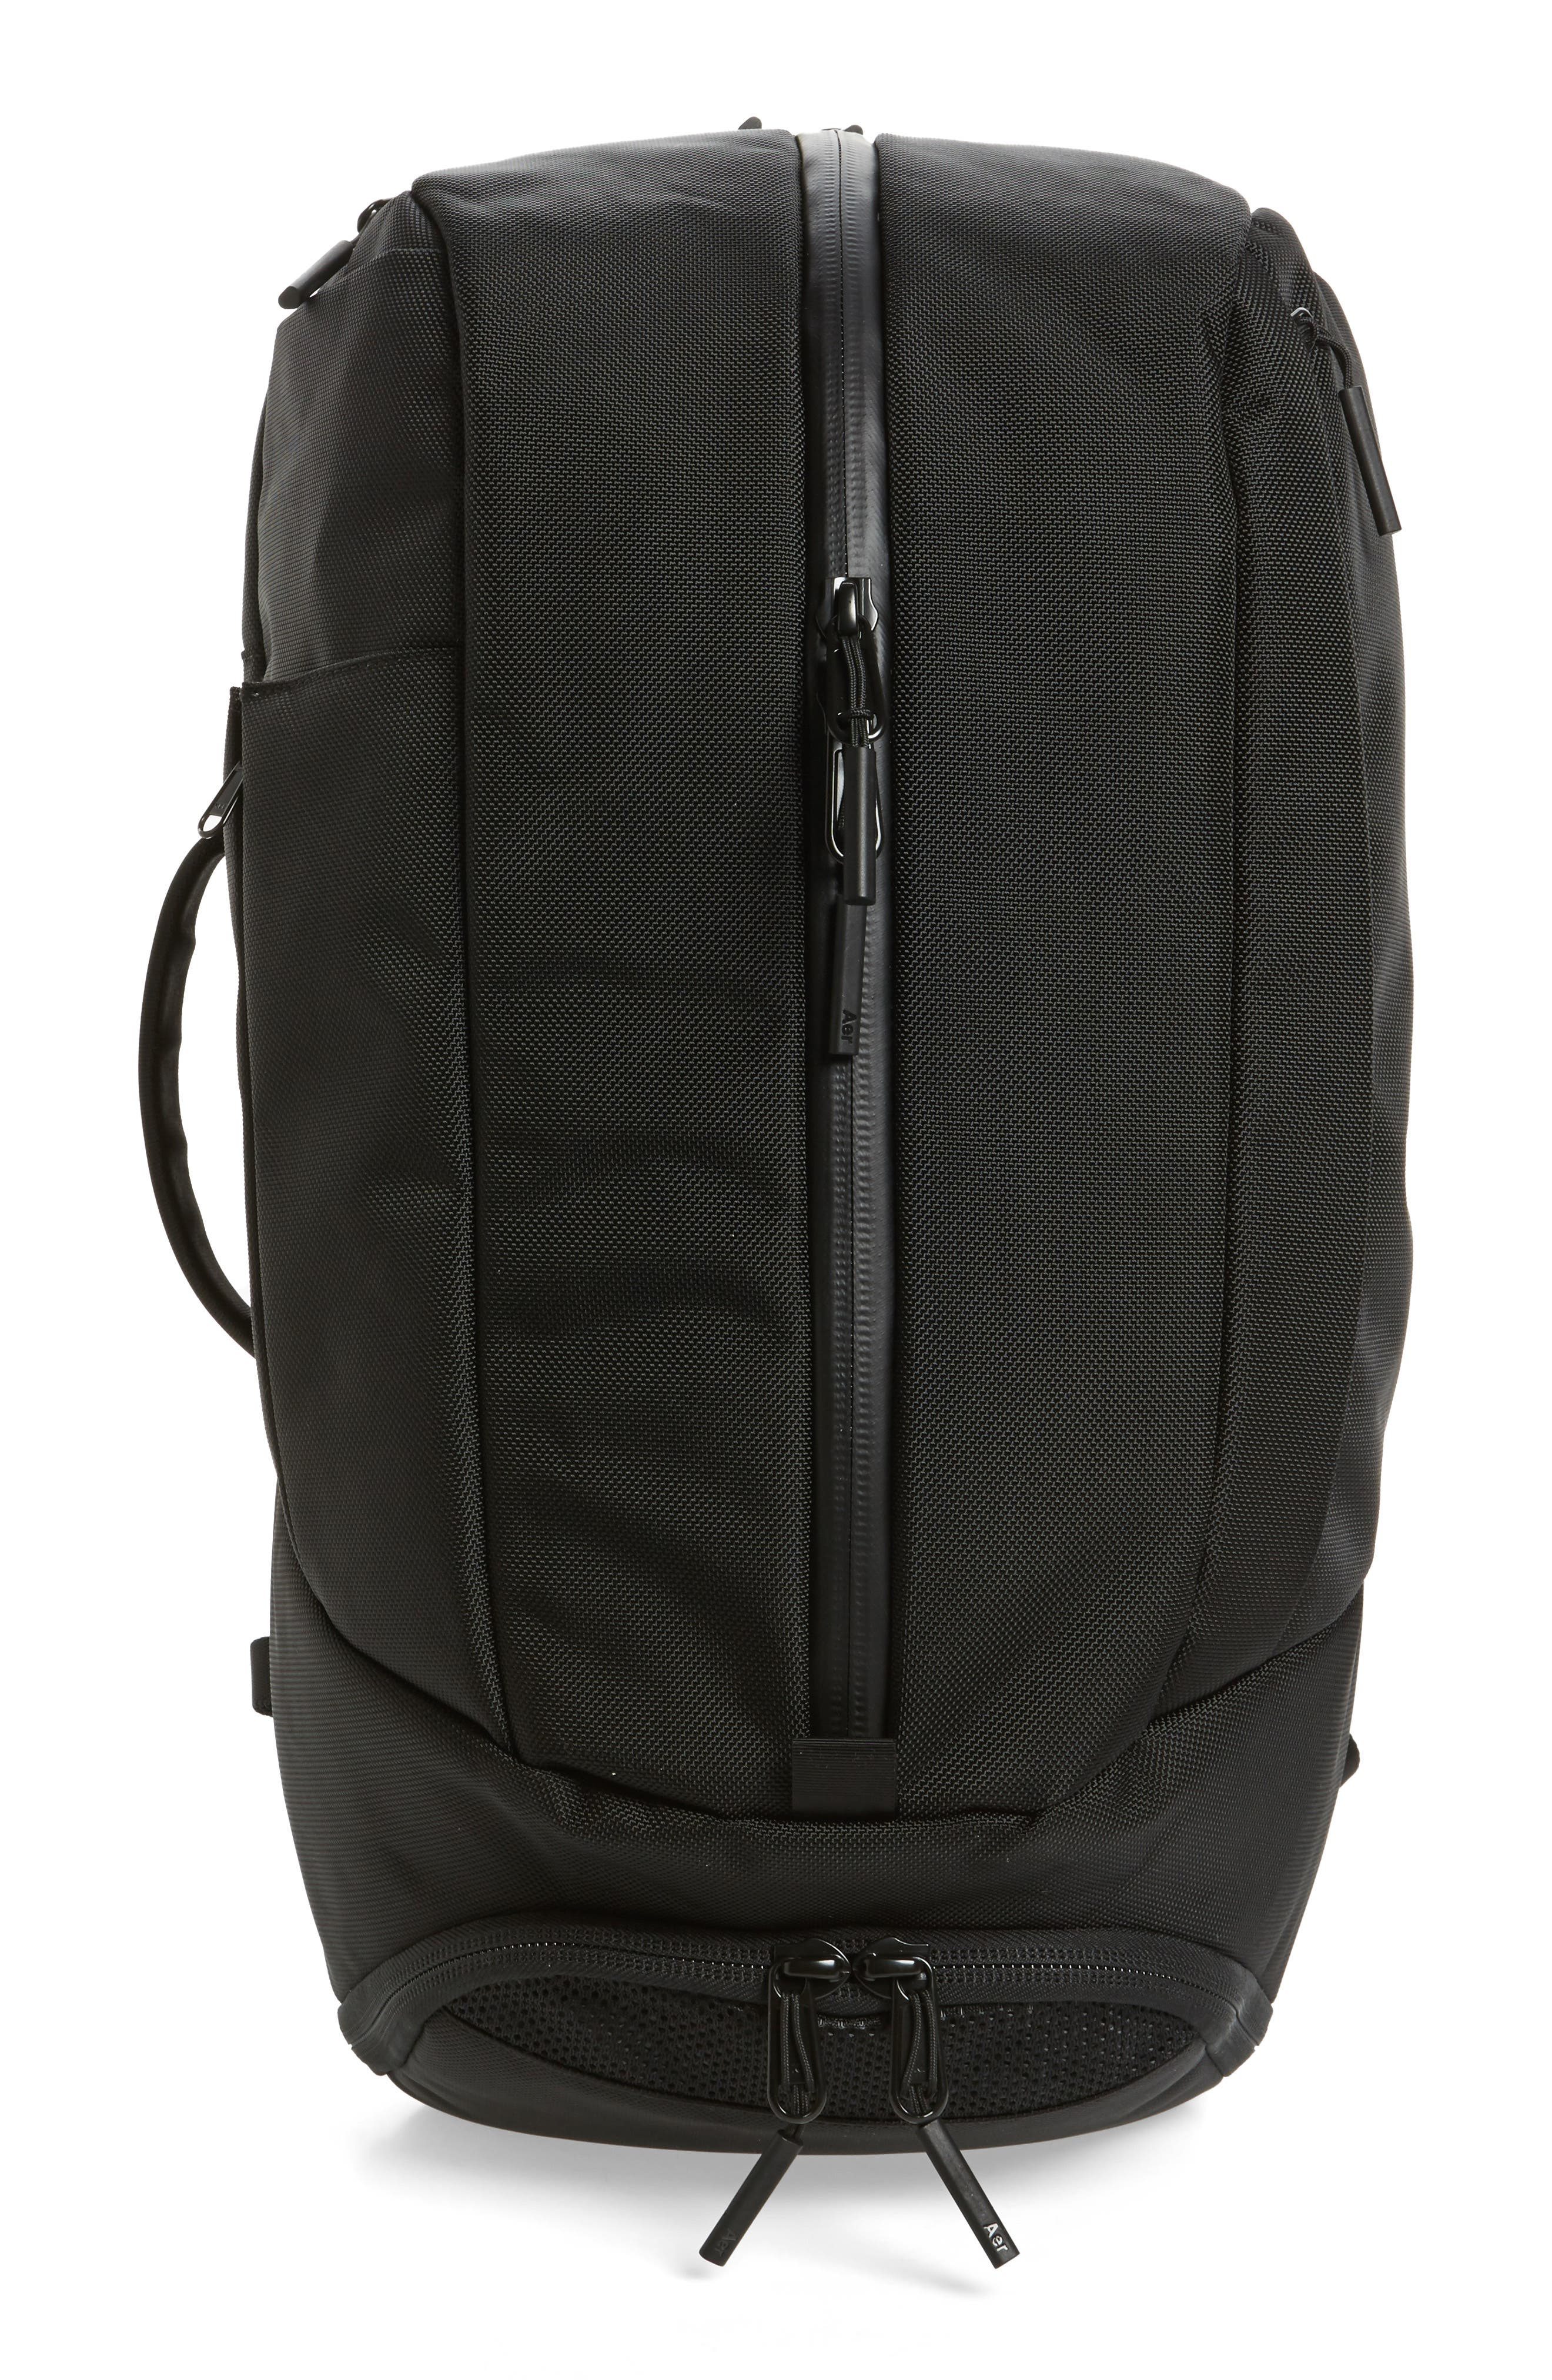 AER Duffel Pack 2 Convertible Backpack, Main, color, BLACK